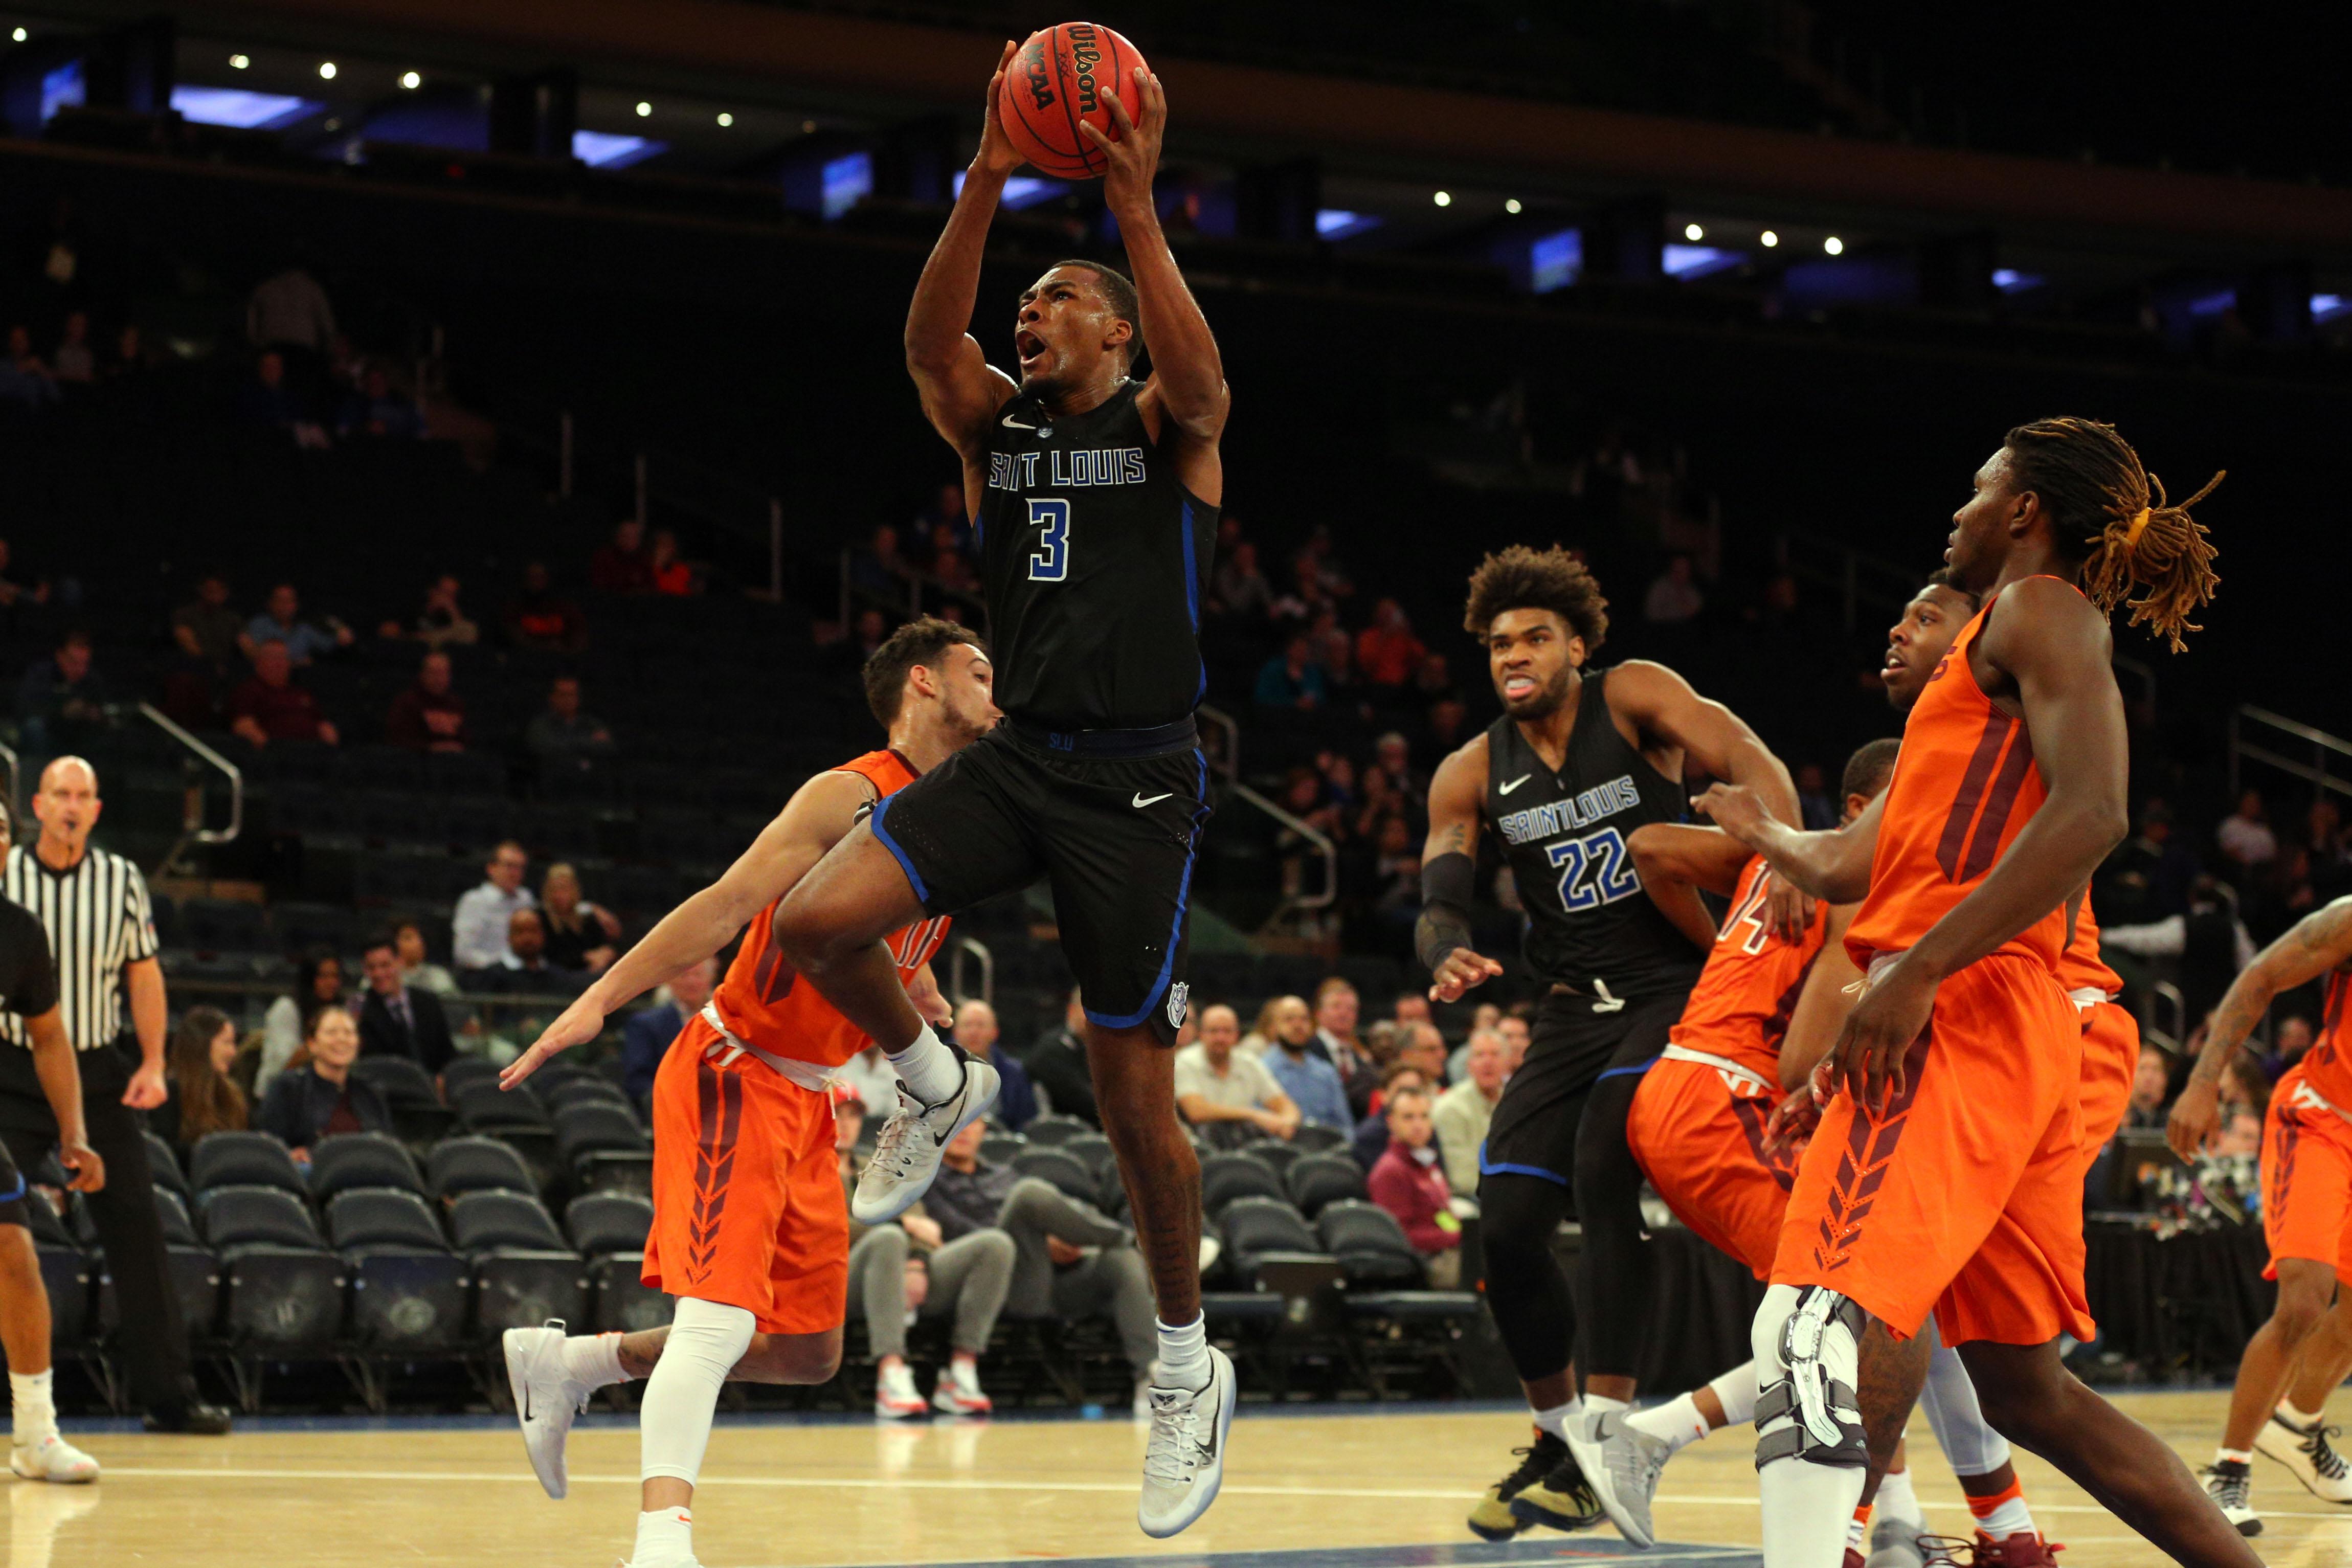 NCAA Basketball: 2K Classic-Virginia Tech vs Saint Louis